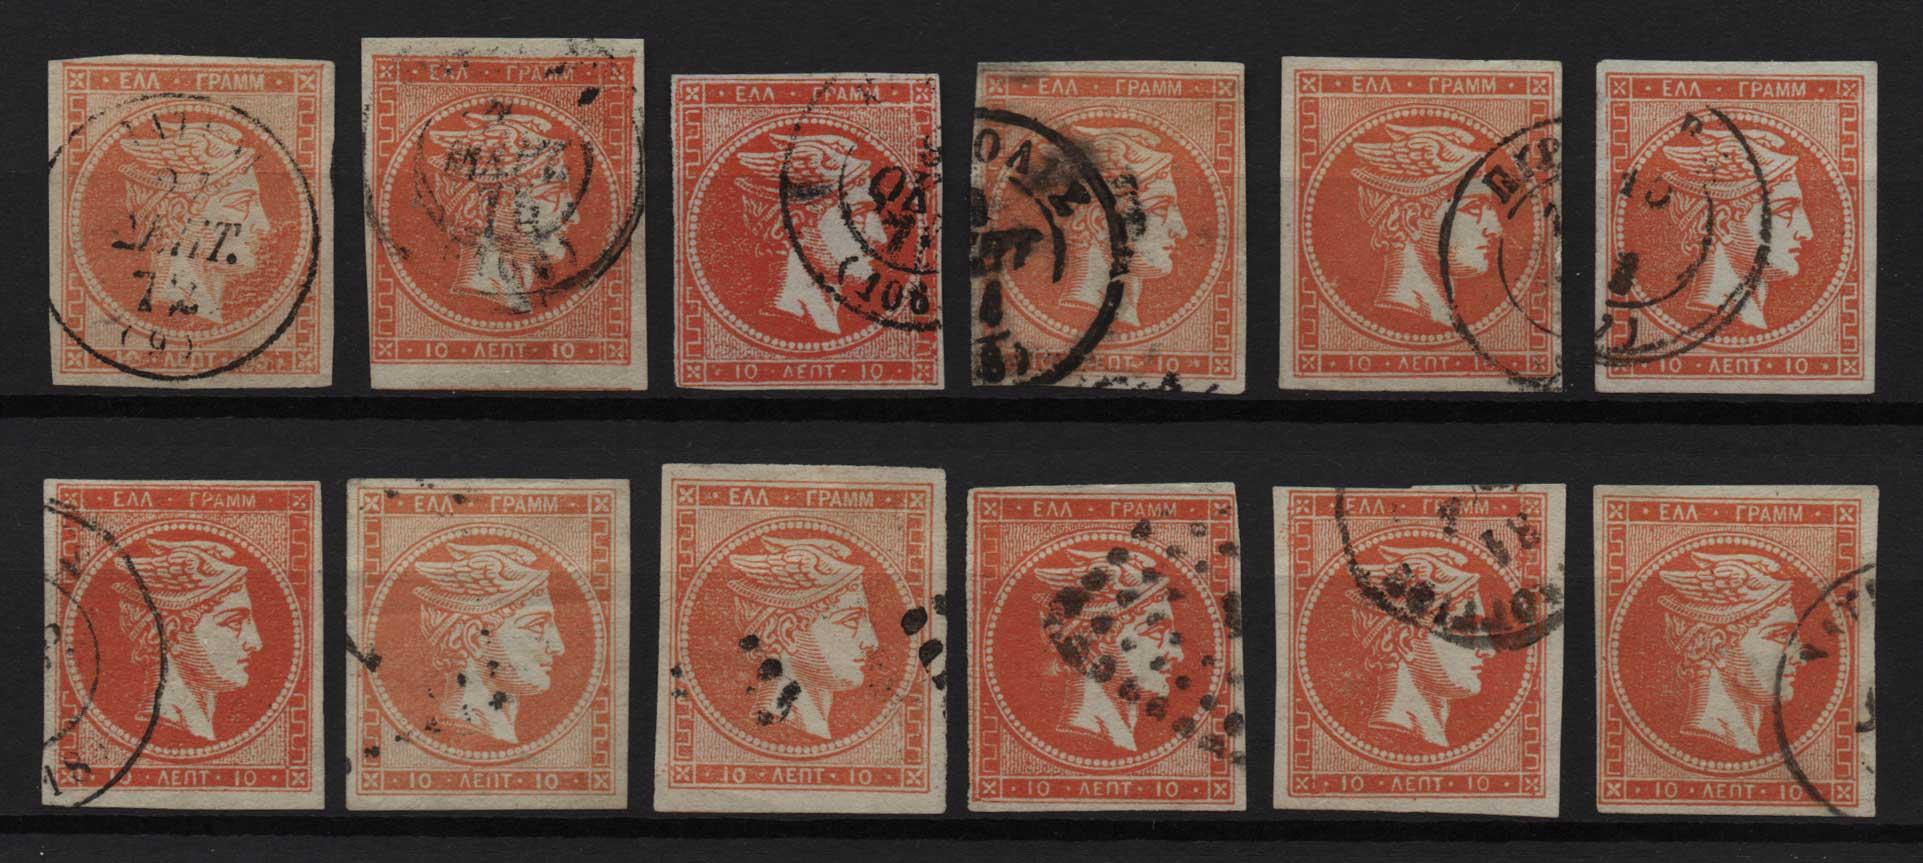 Lot 32 - -  LARGE HERMES HEAD large hermes head -  Athens Auctions Public Auction 75 General Stamp Sale